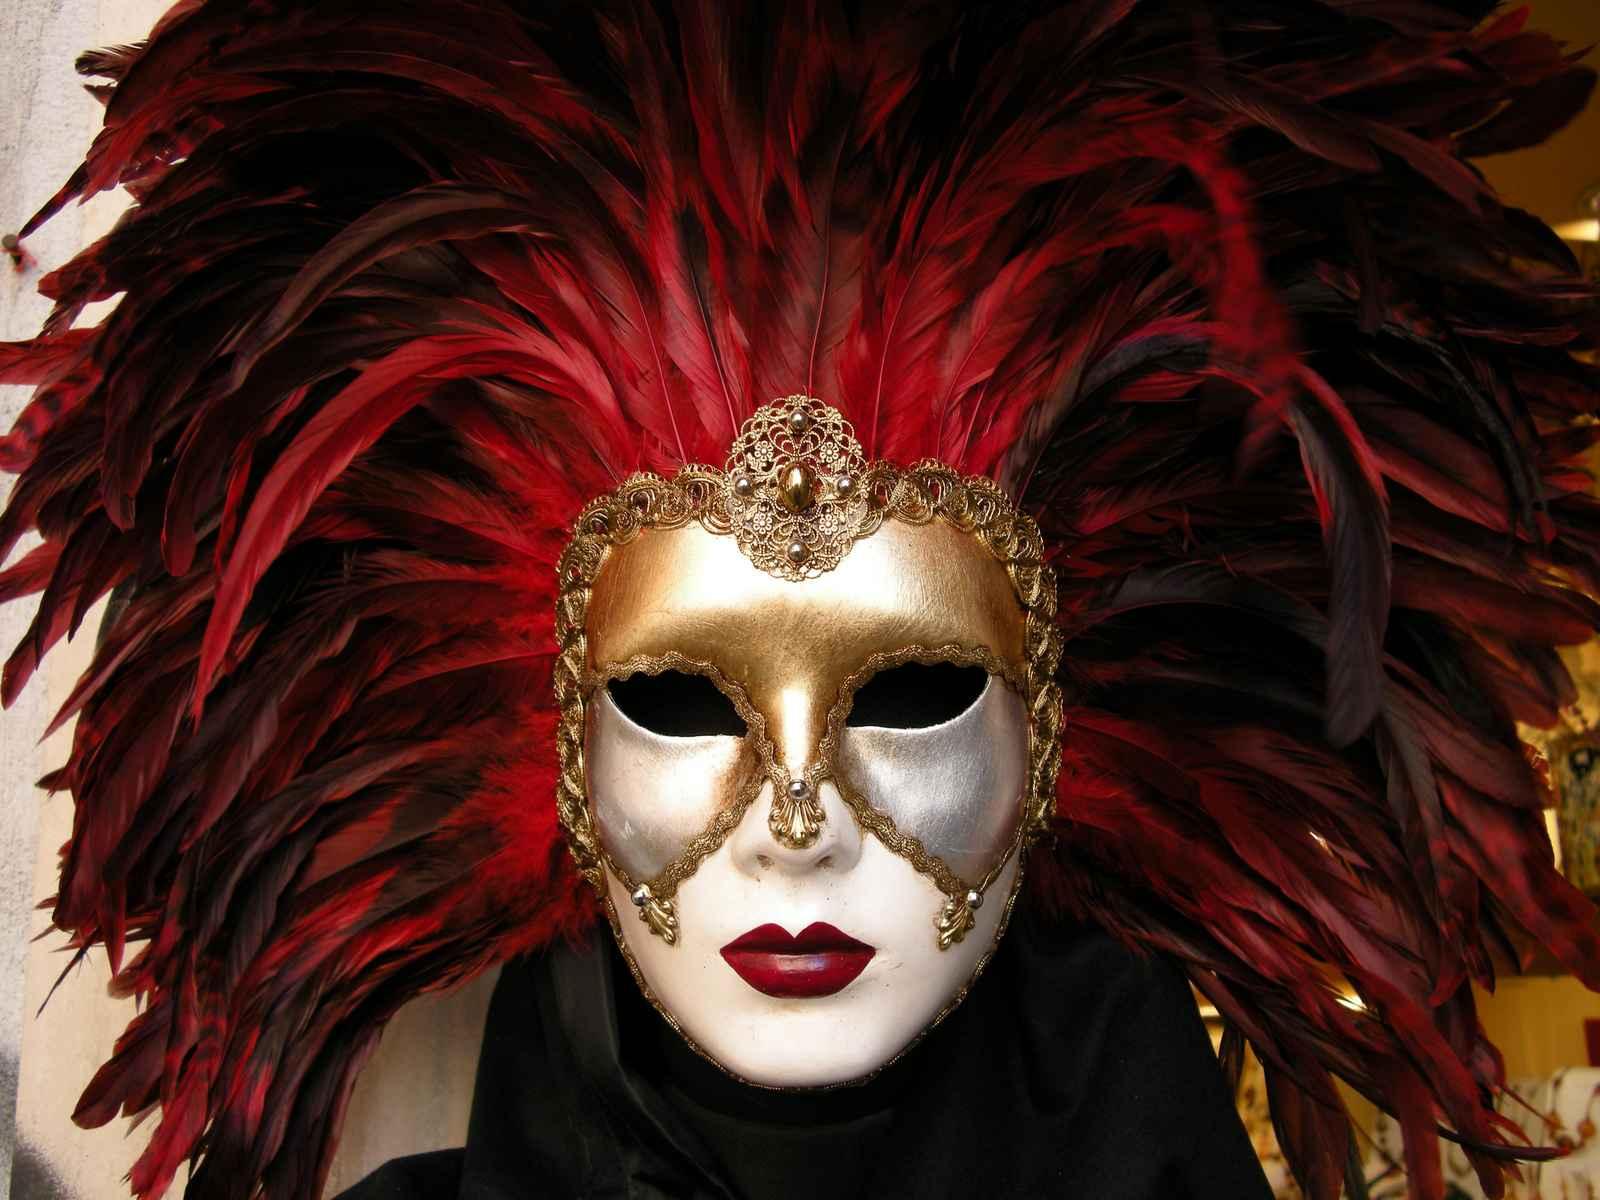 venetian-mask-italy-photo-by-john-ecker.jpg w=950&h=712